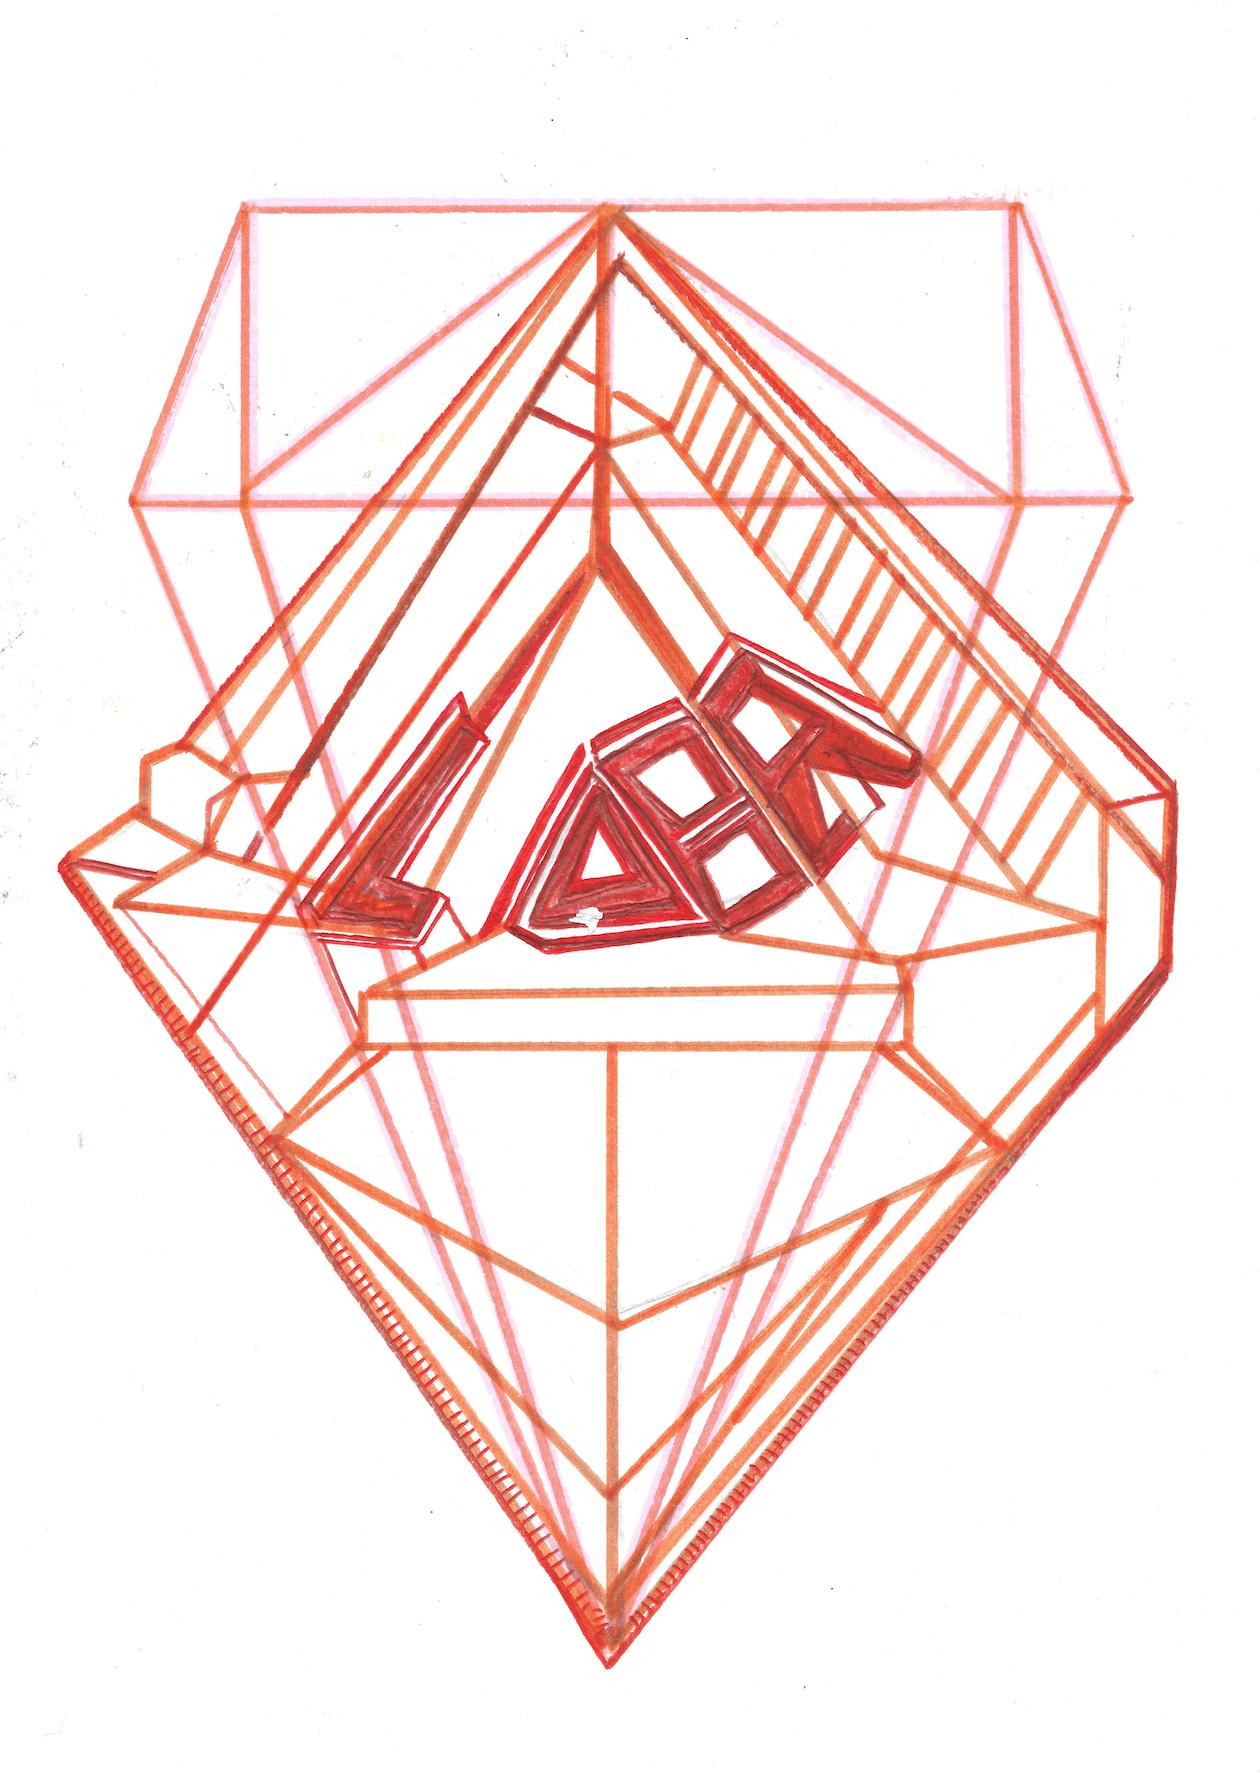 LAB-A diamante